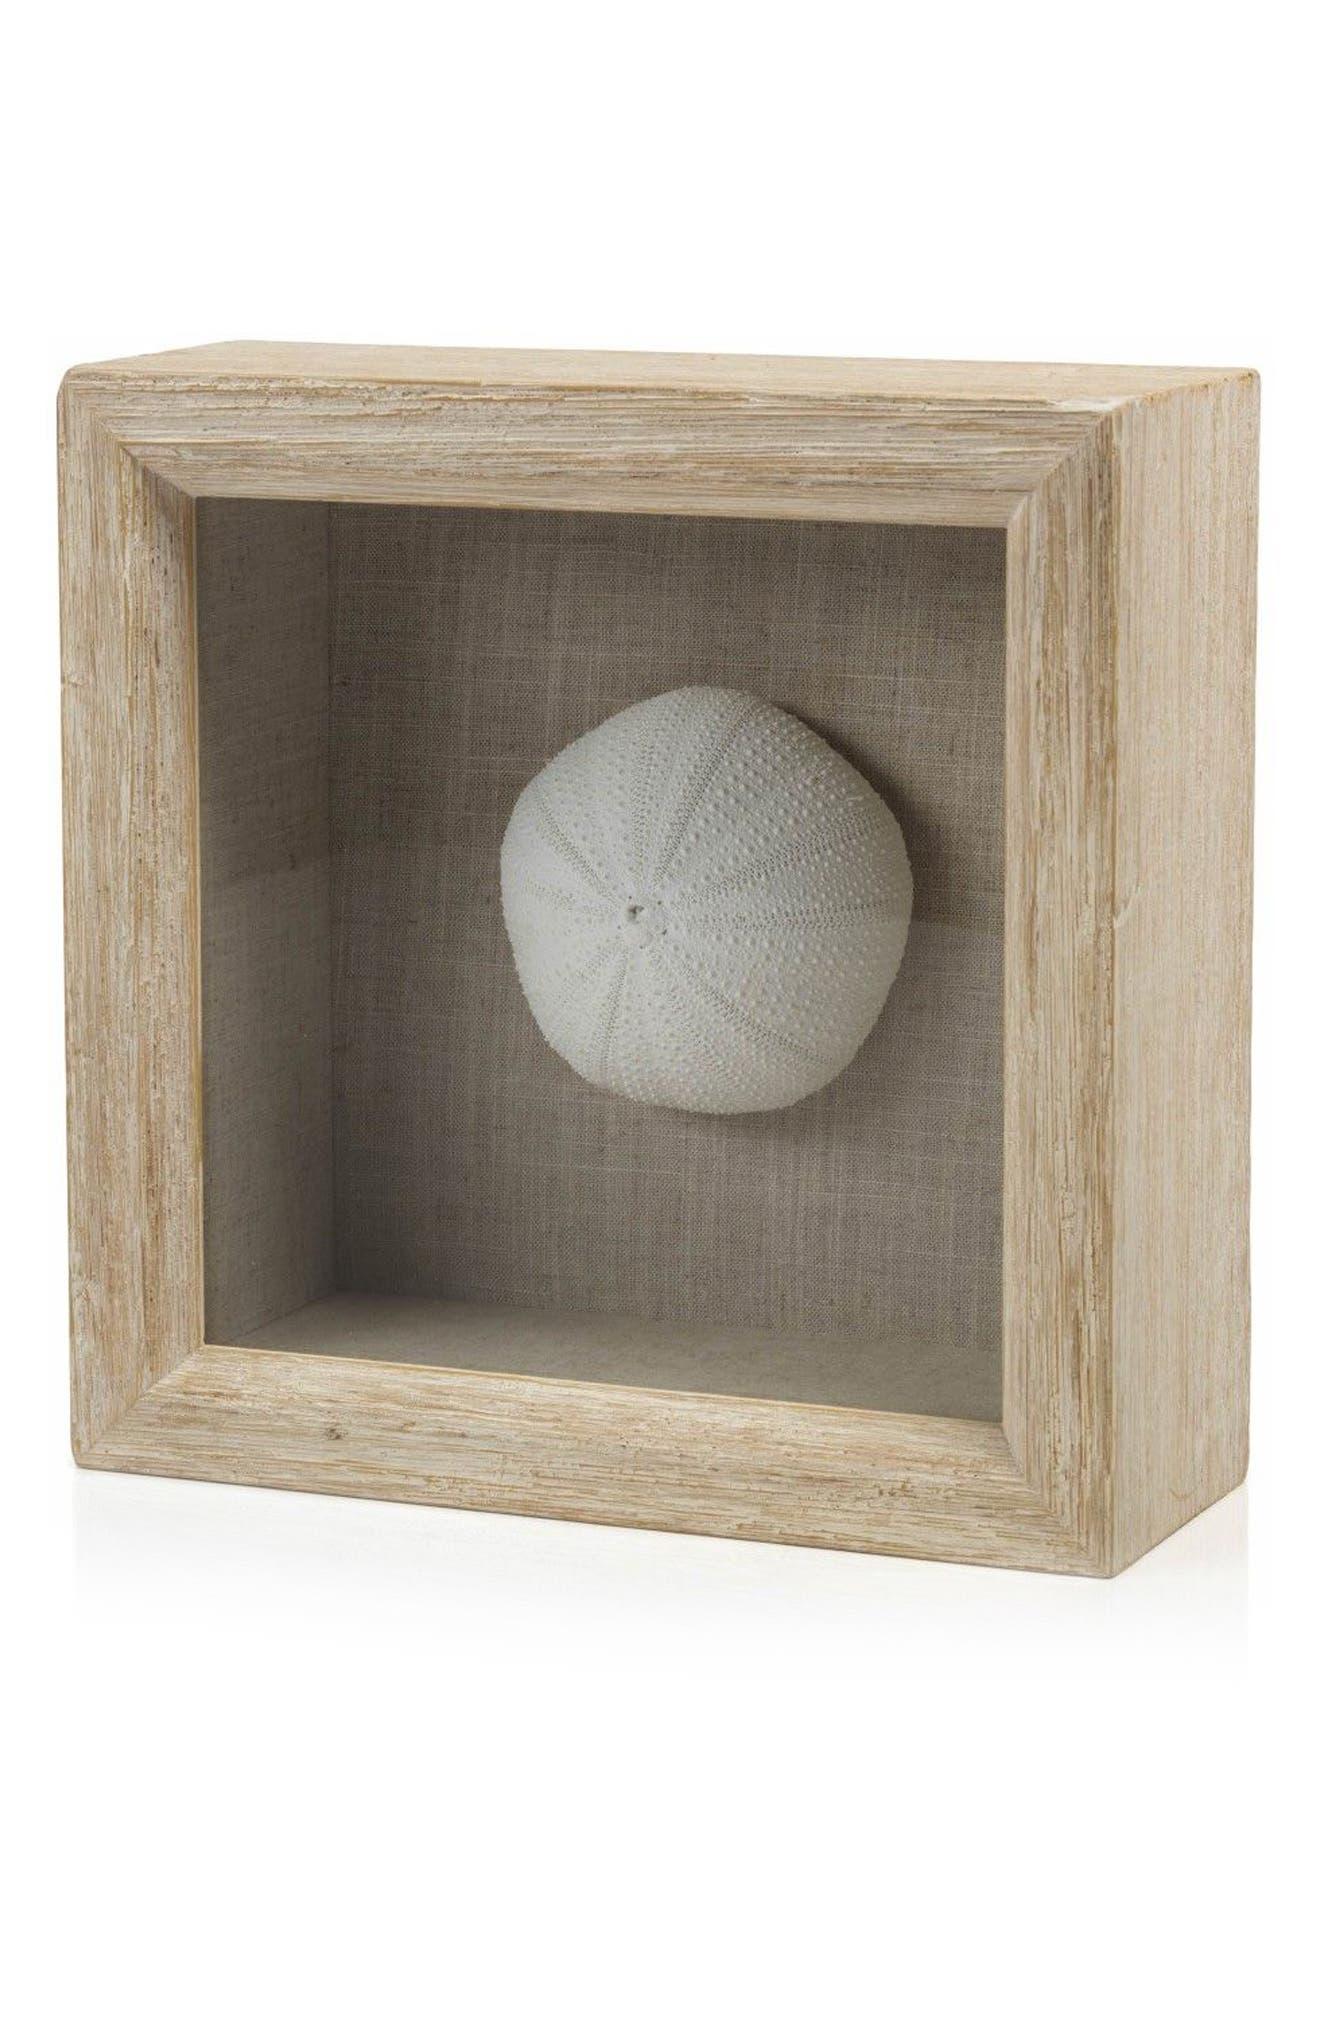 Sea Urchin Shadow Box Art,                         Main,                         color, Off-White/ Brown/ Beige